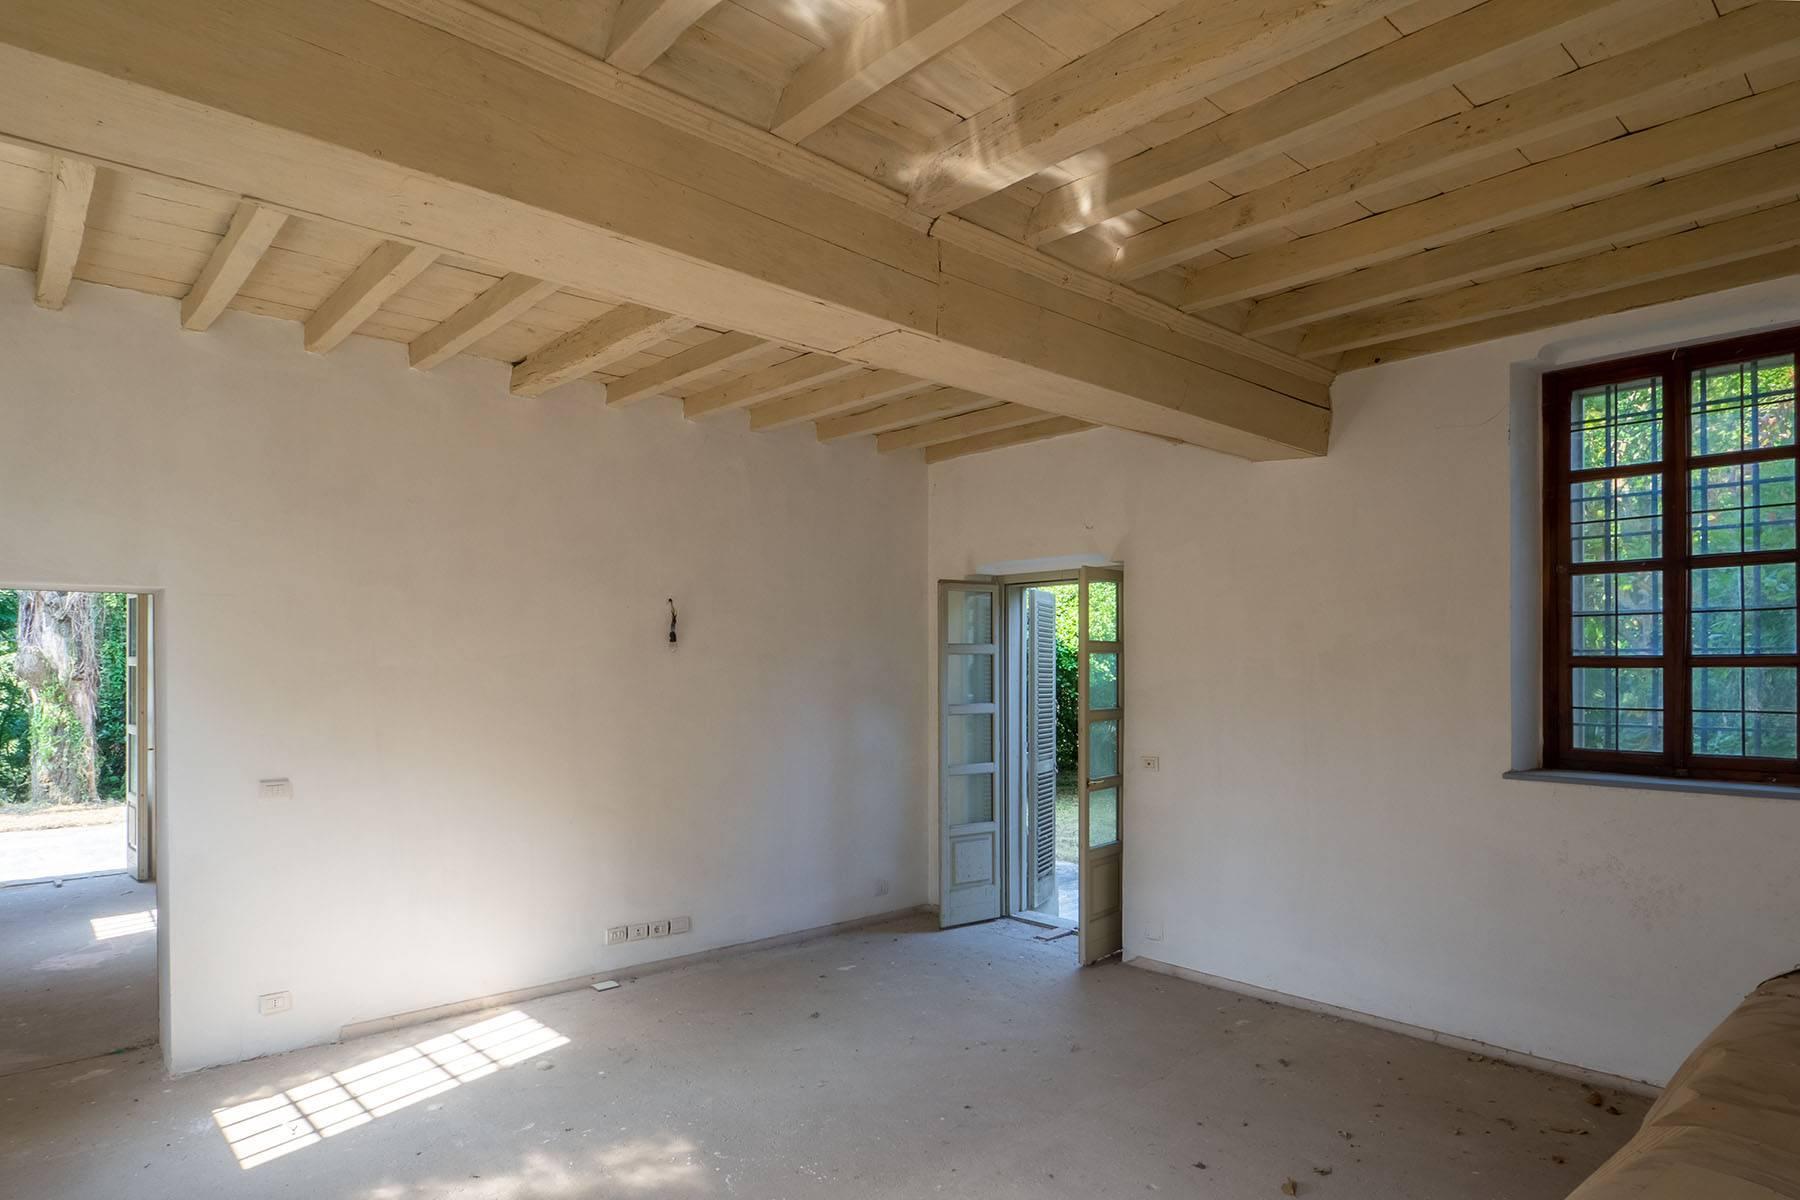 Casa indipendente in Vendita a Torino: 5 locali, 400 mq - Foto 6